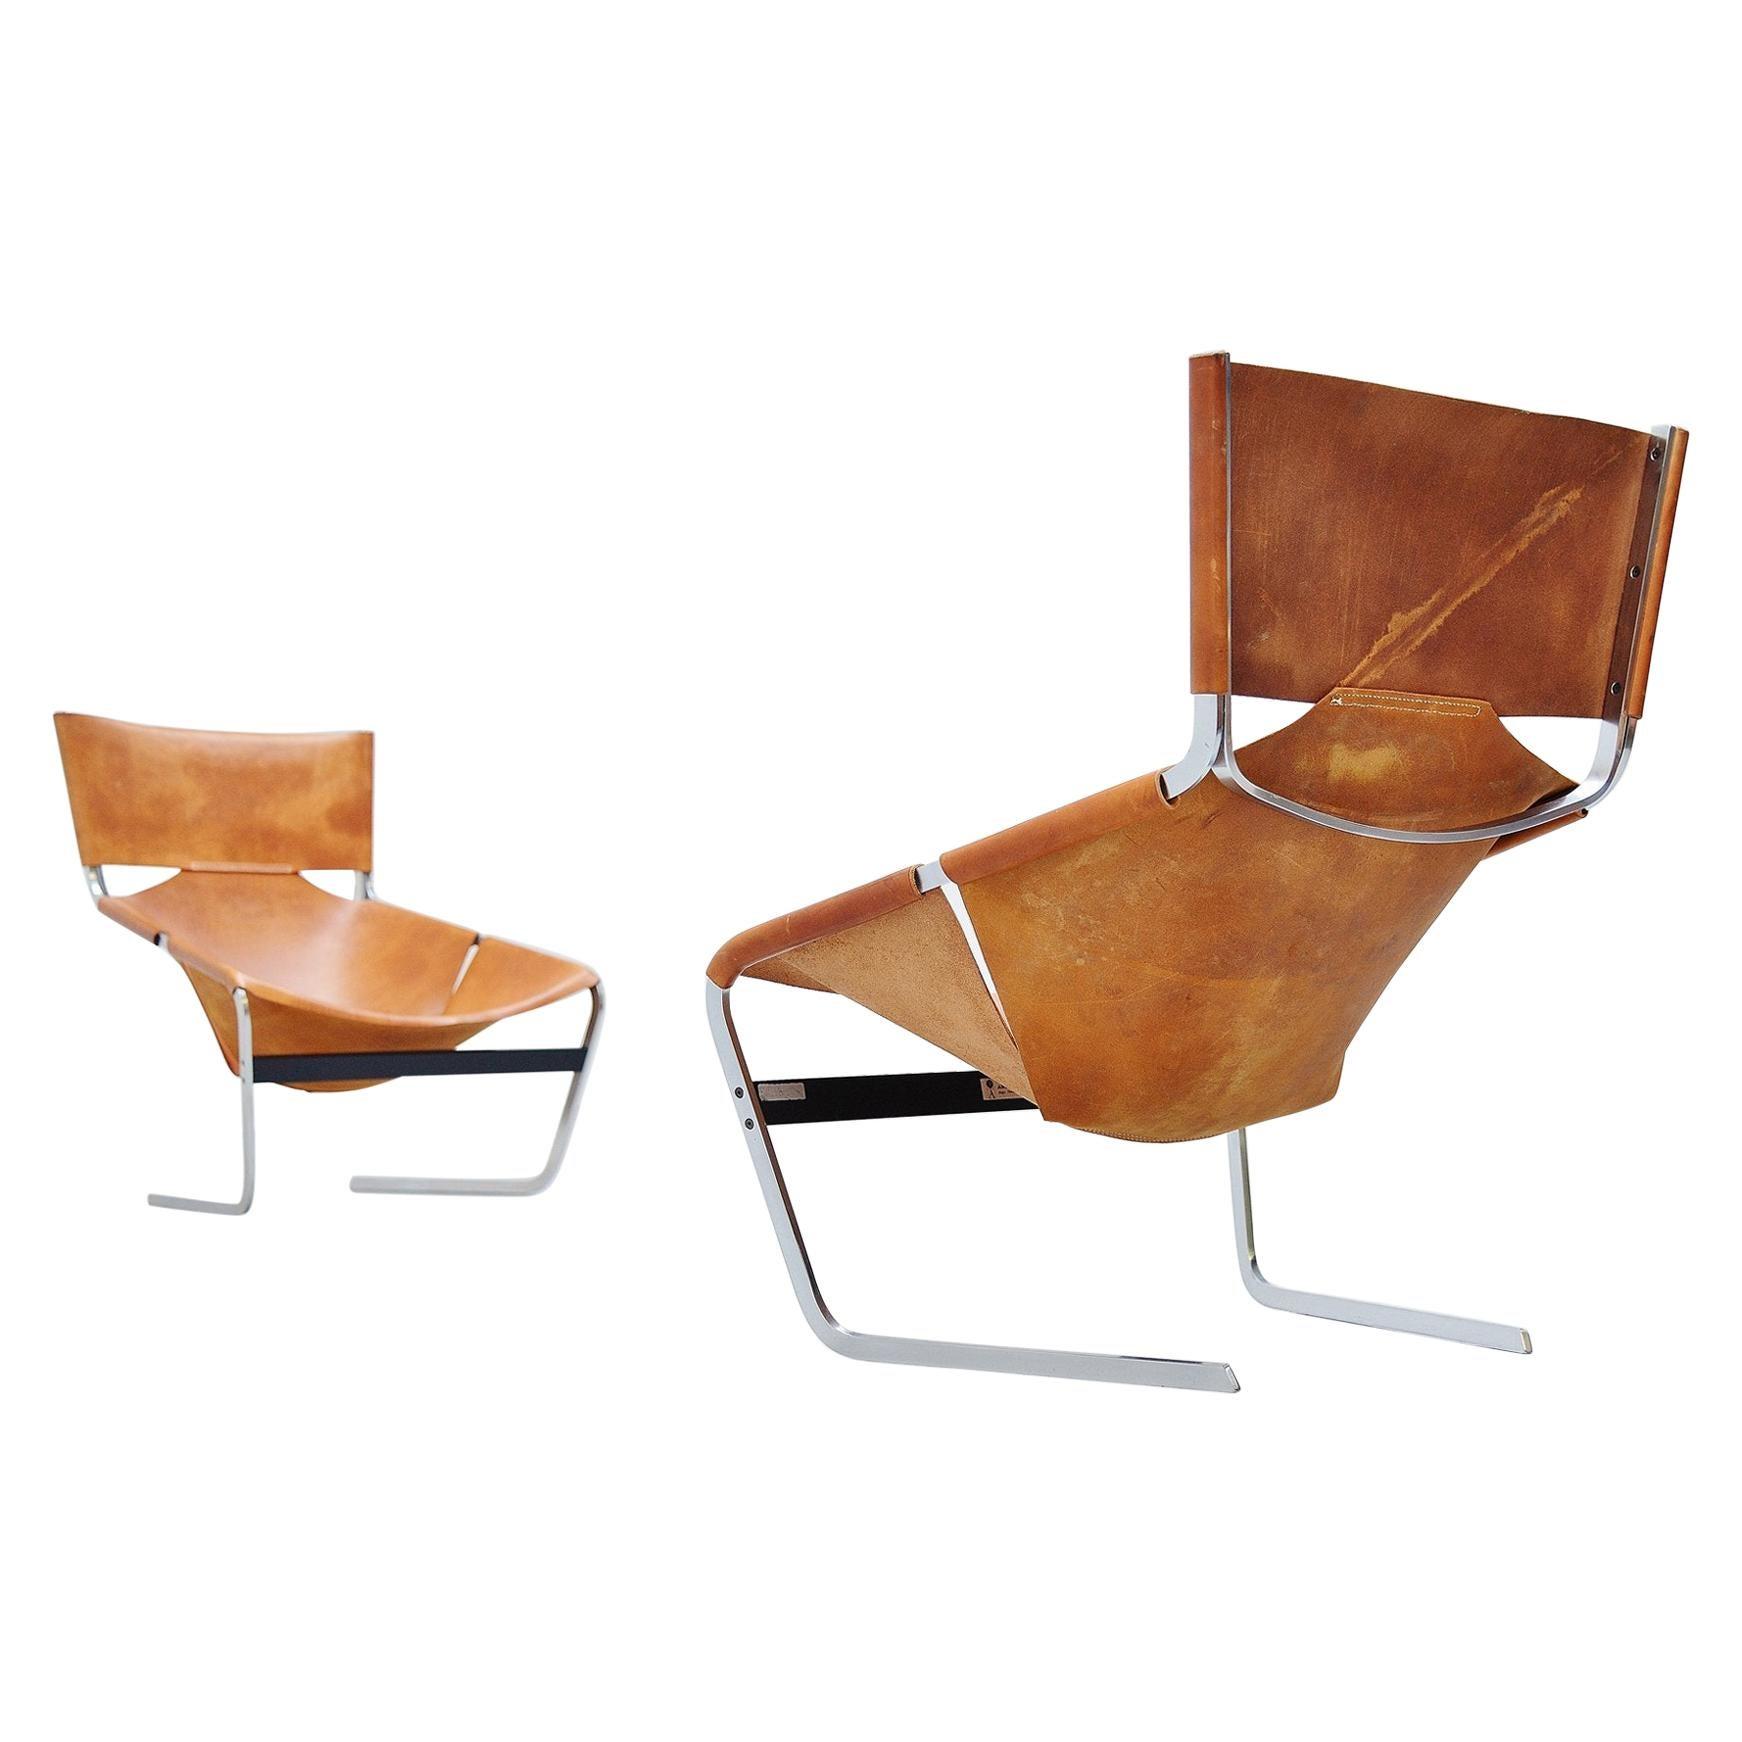 Pierre Paulin Pair of F444 Lounge Chairs Artifort, 1963